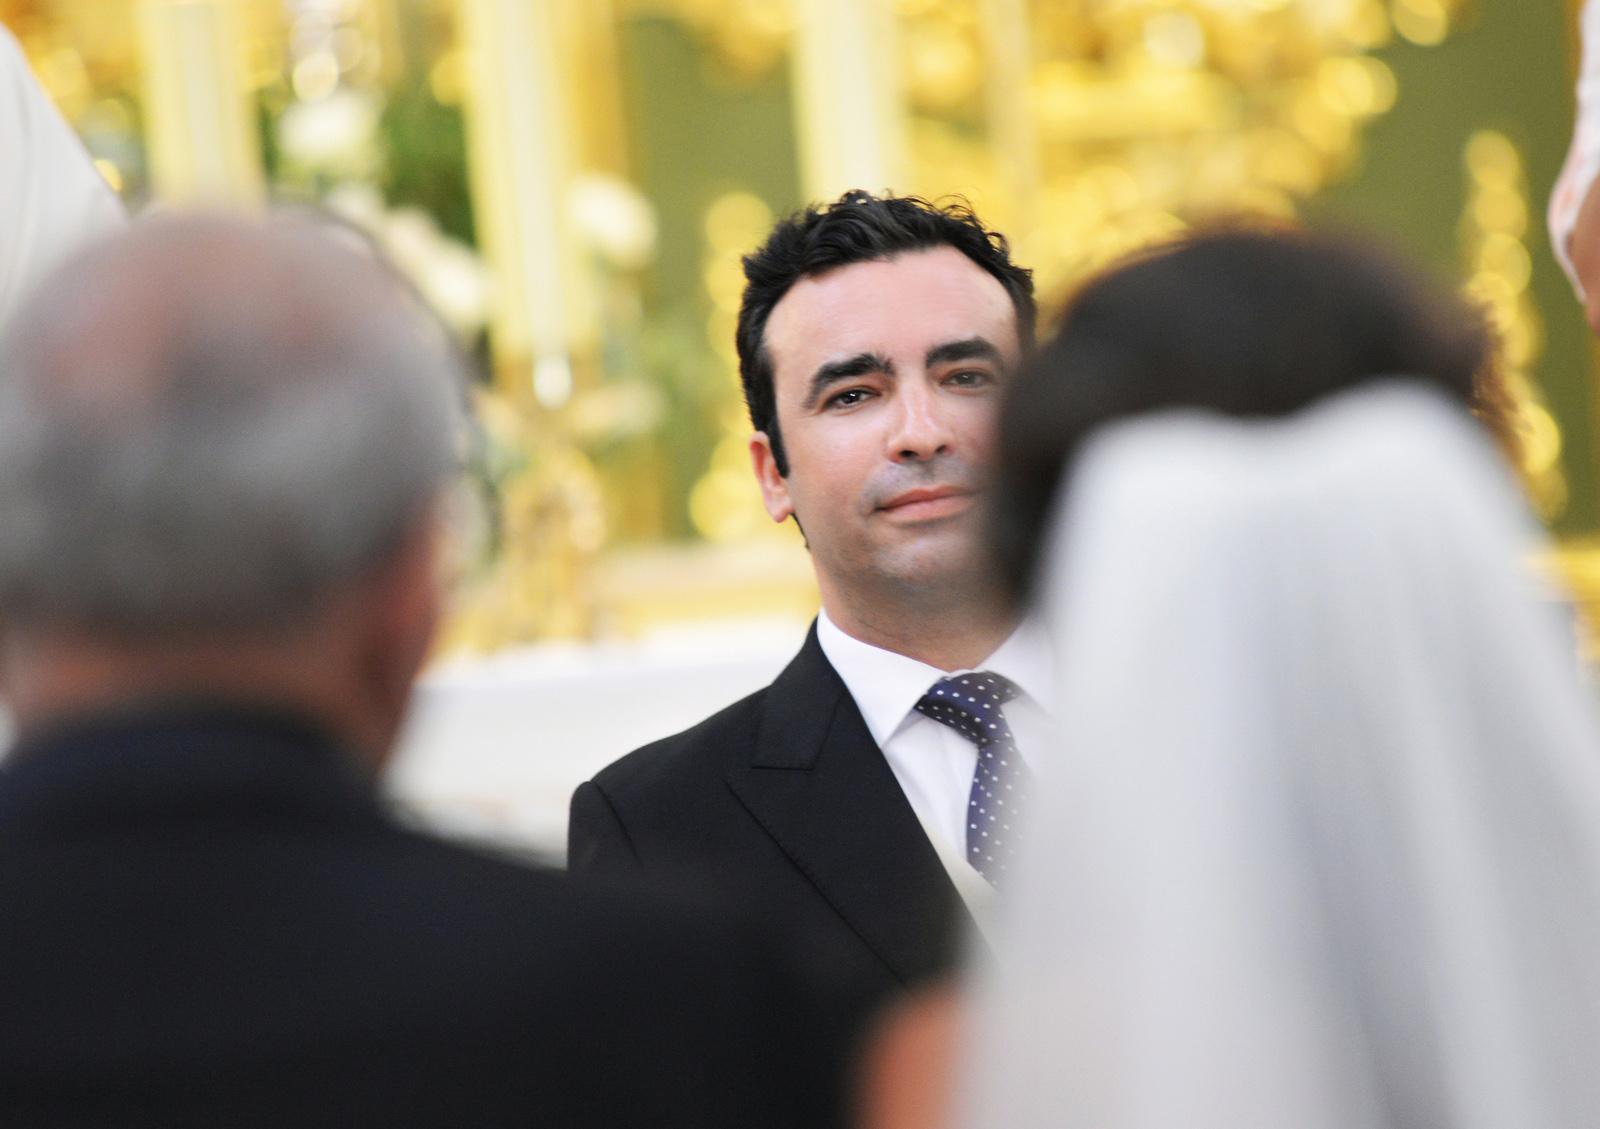 photo goom watching at bride arriving